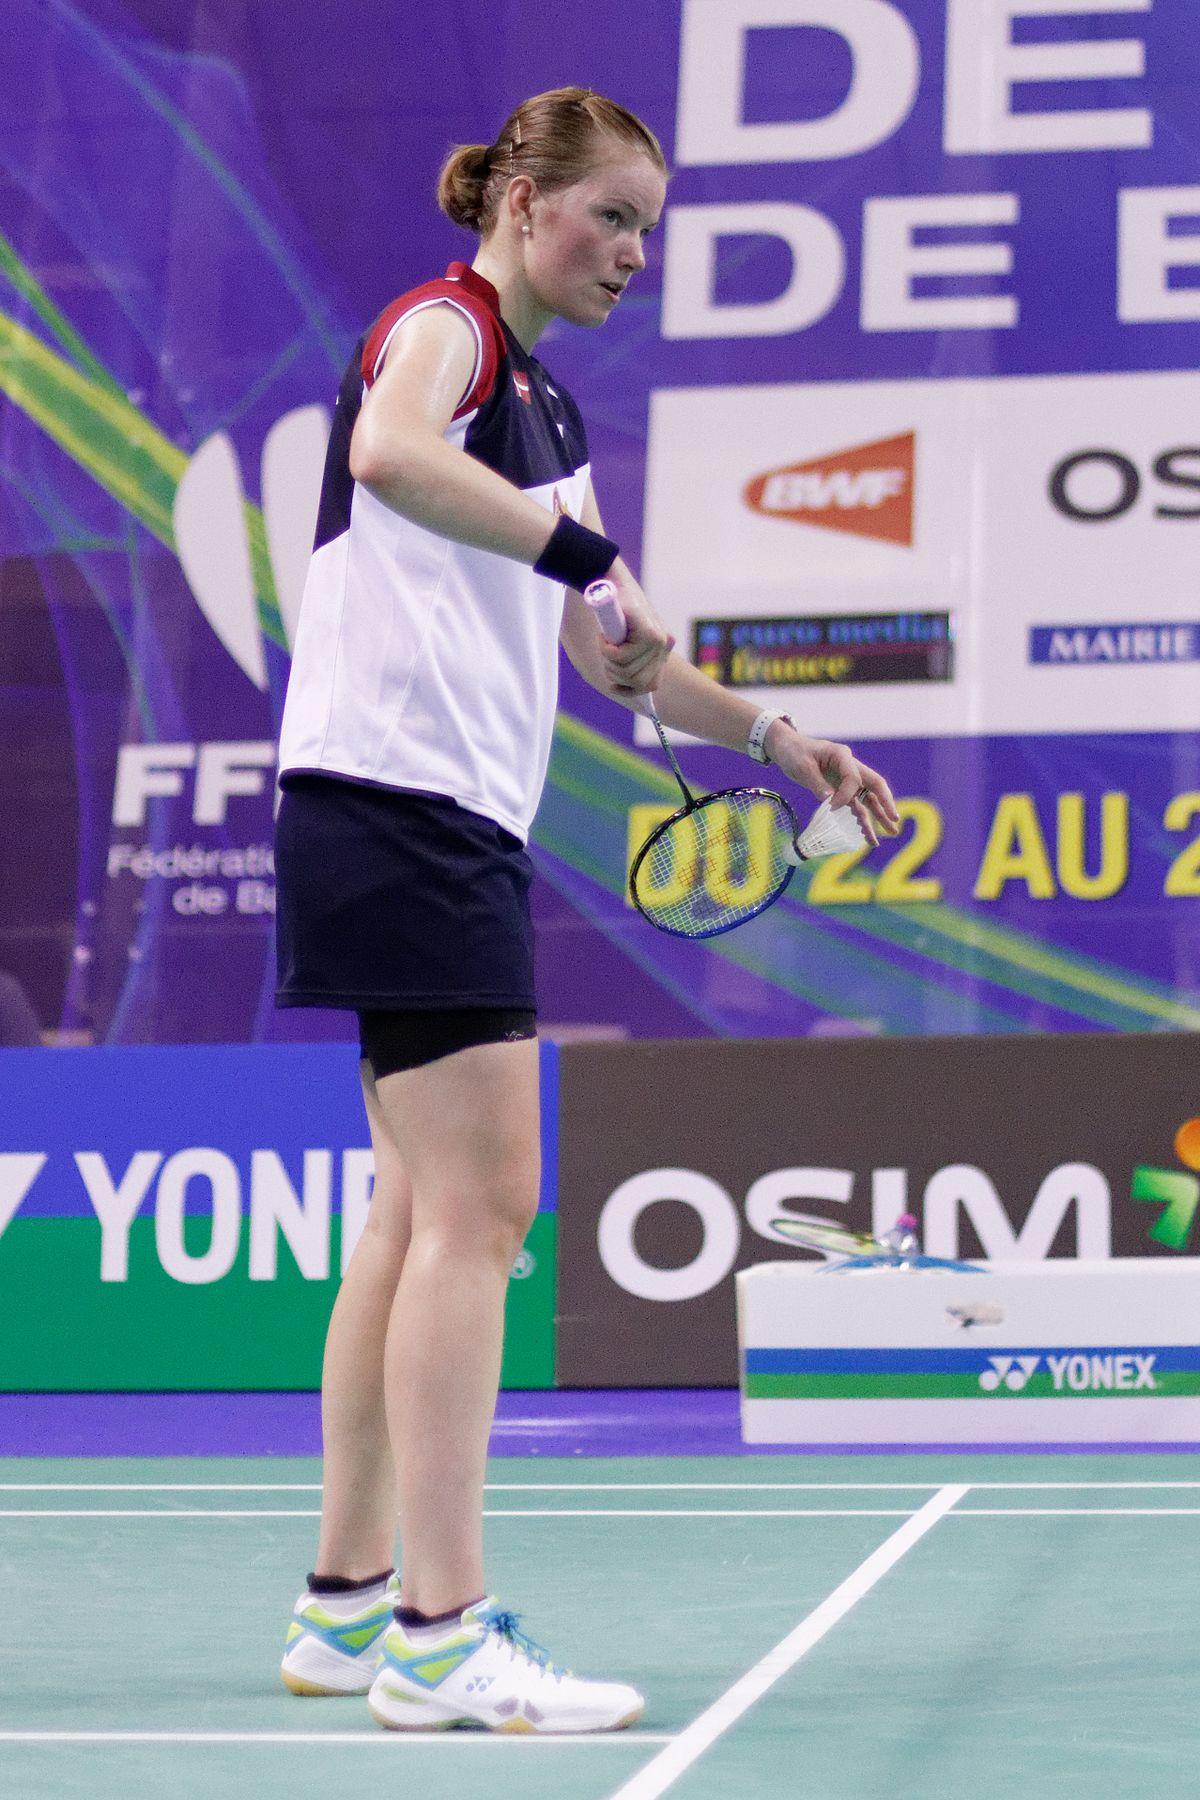 EM i badminton 2016 den frie encyklop¦di